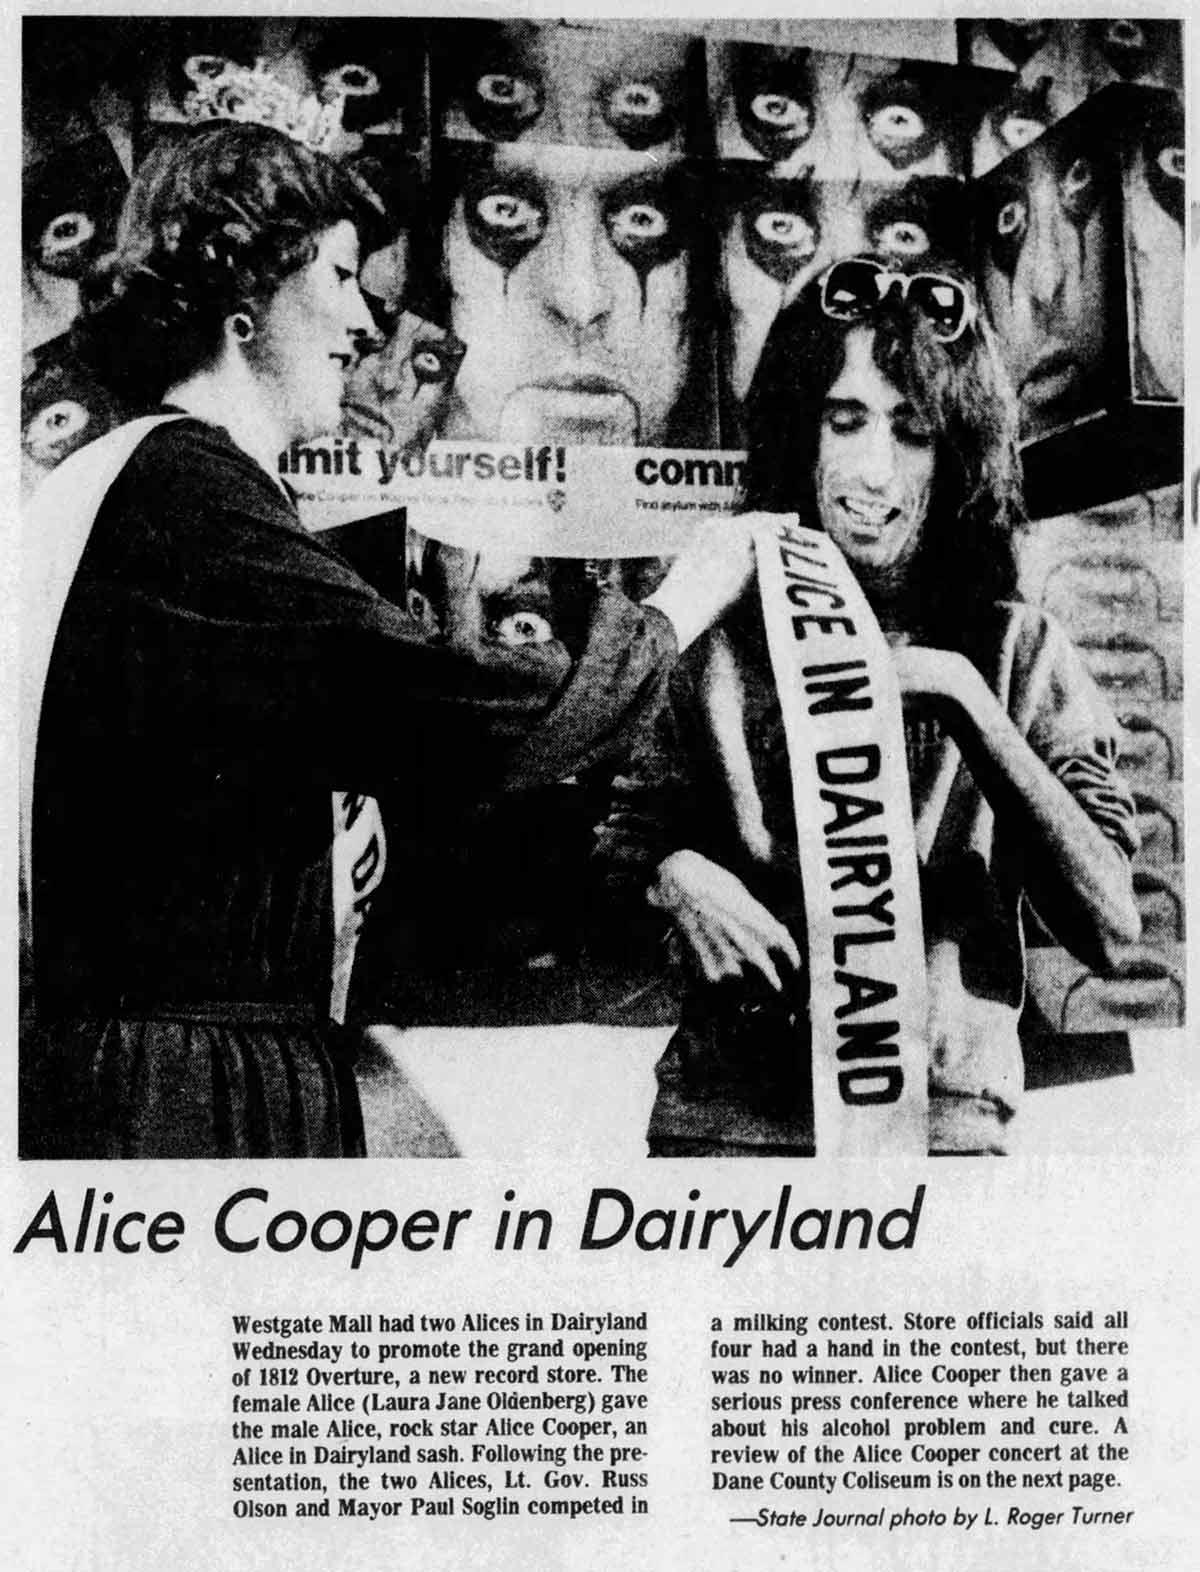 Alice in Dairyland